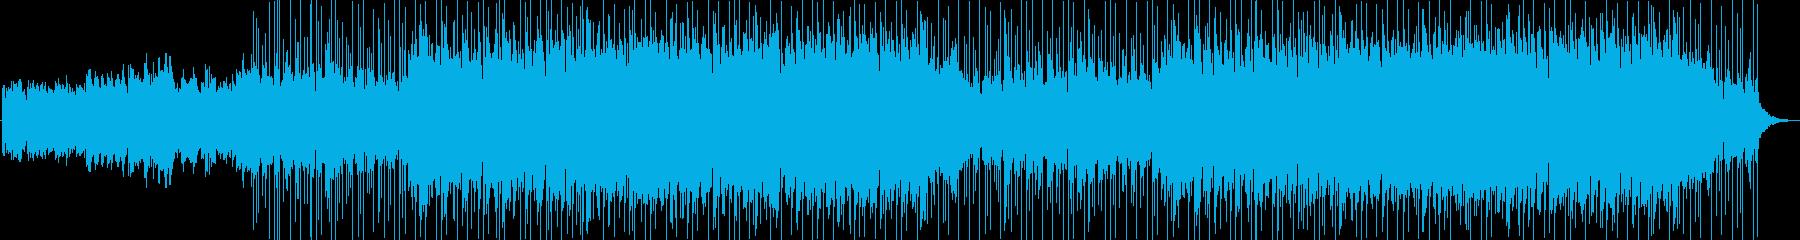 Península de Yucatán2の再生済みの波形